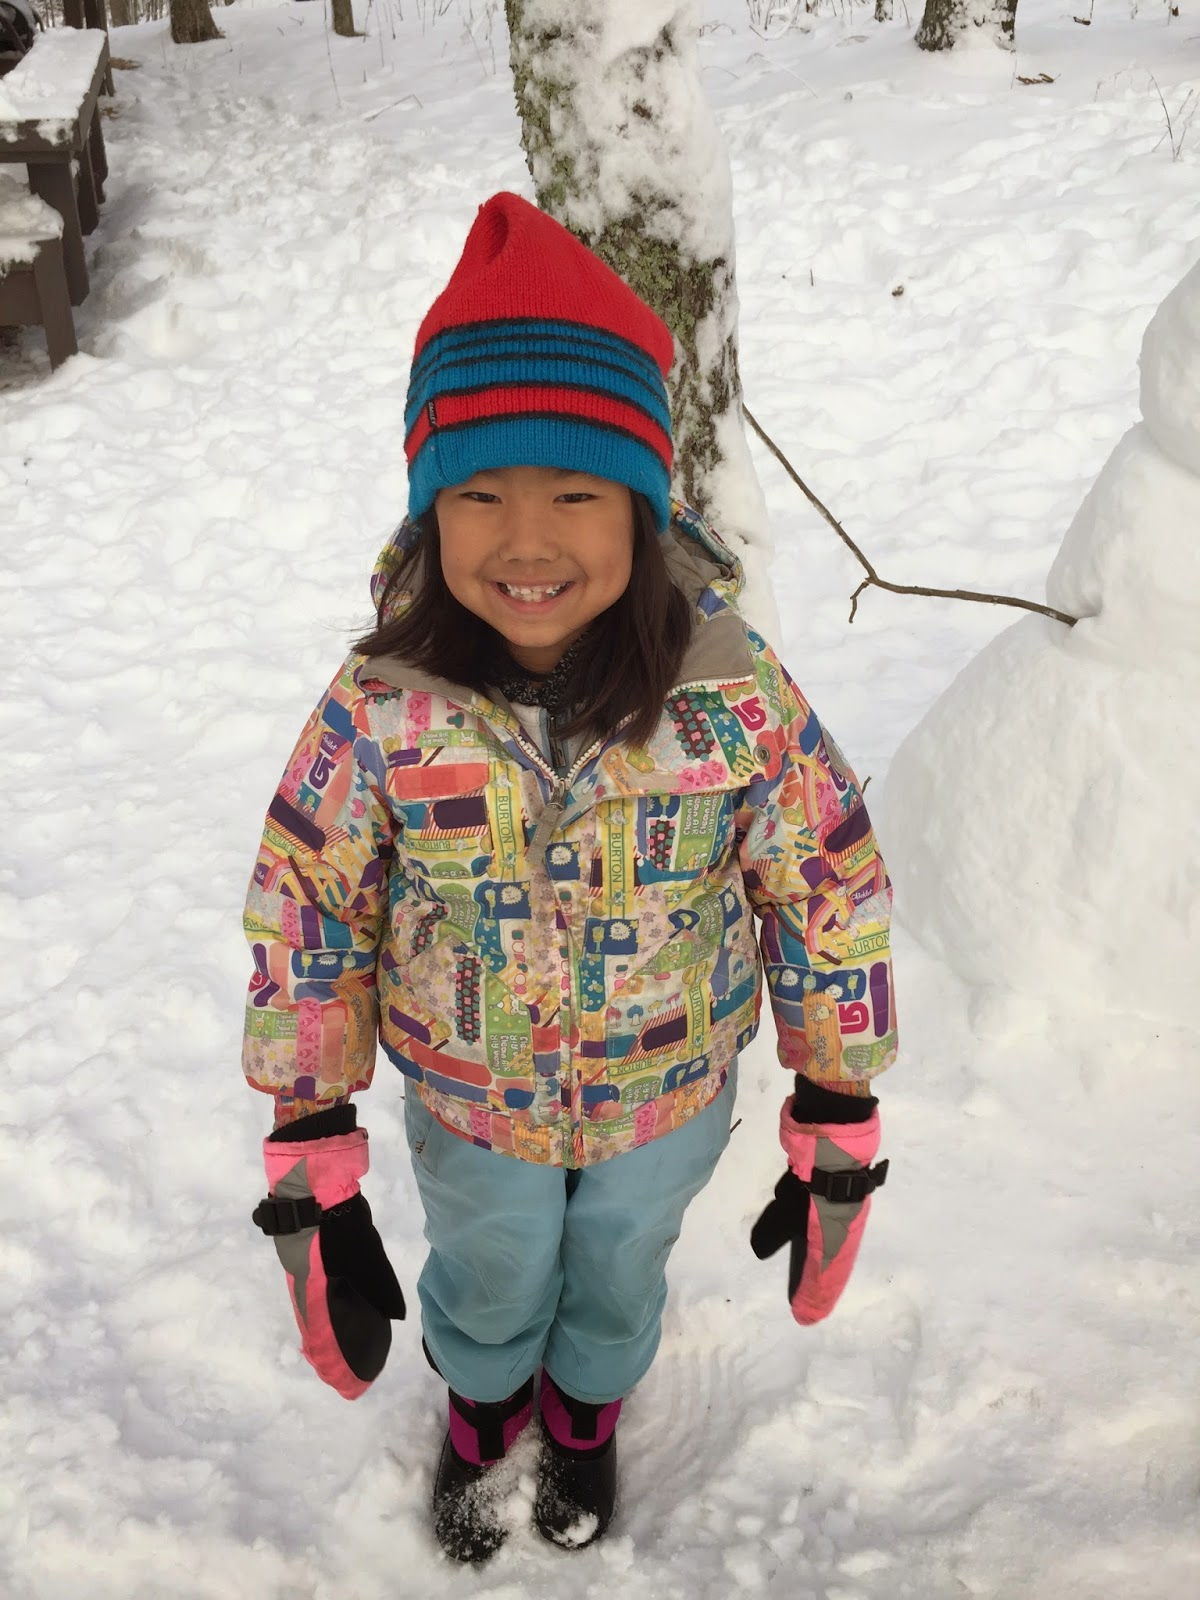 burton jacket, spyder ski pants